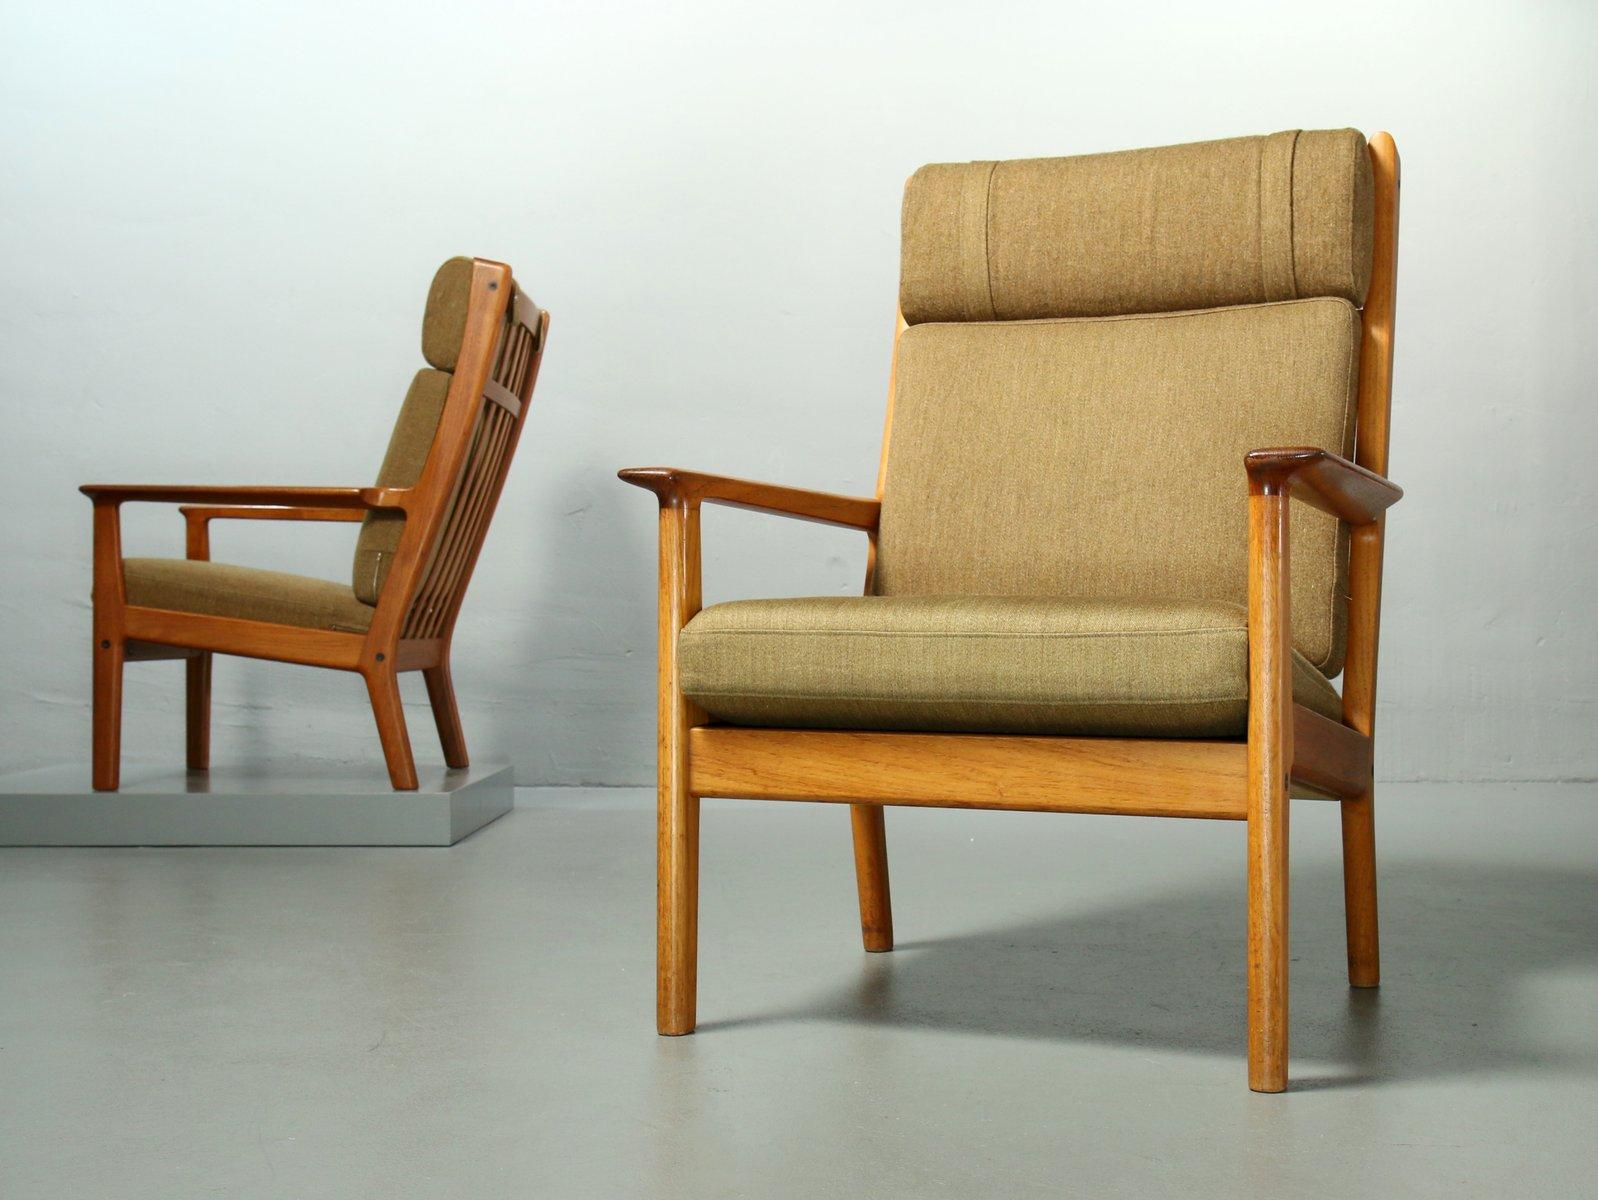 65a teak sessel mit hoher r ckenlehne von hans j wegner f r getama 1970er 2er set bei pamono. Black Bedroom Furniture Sets. Home Design Ideas